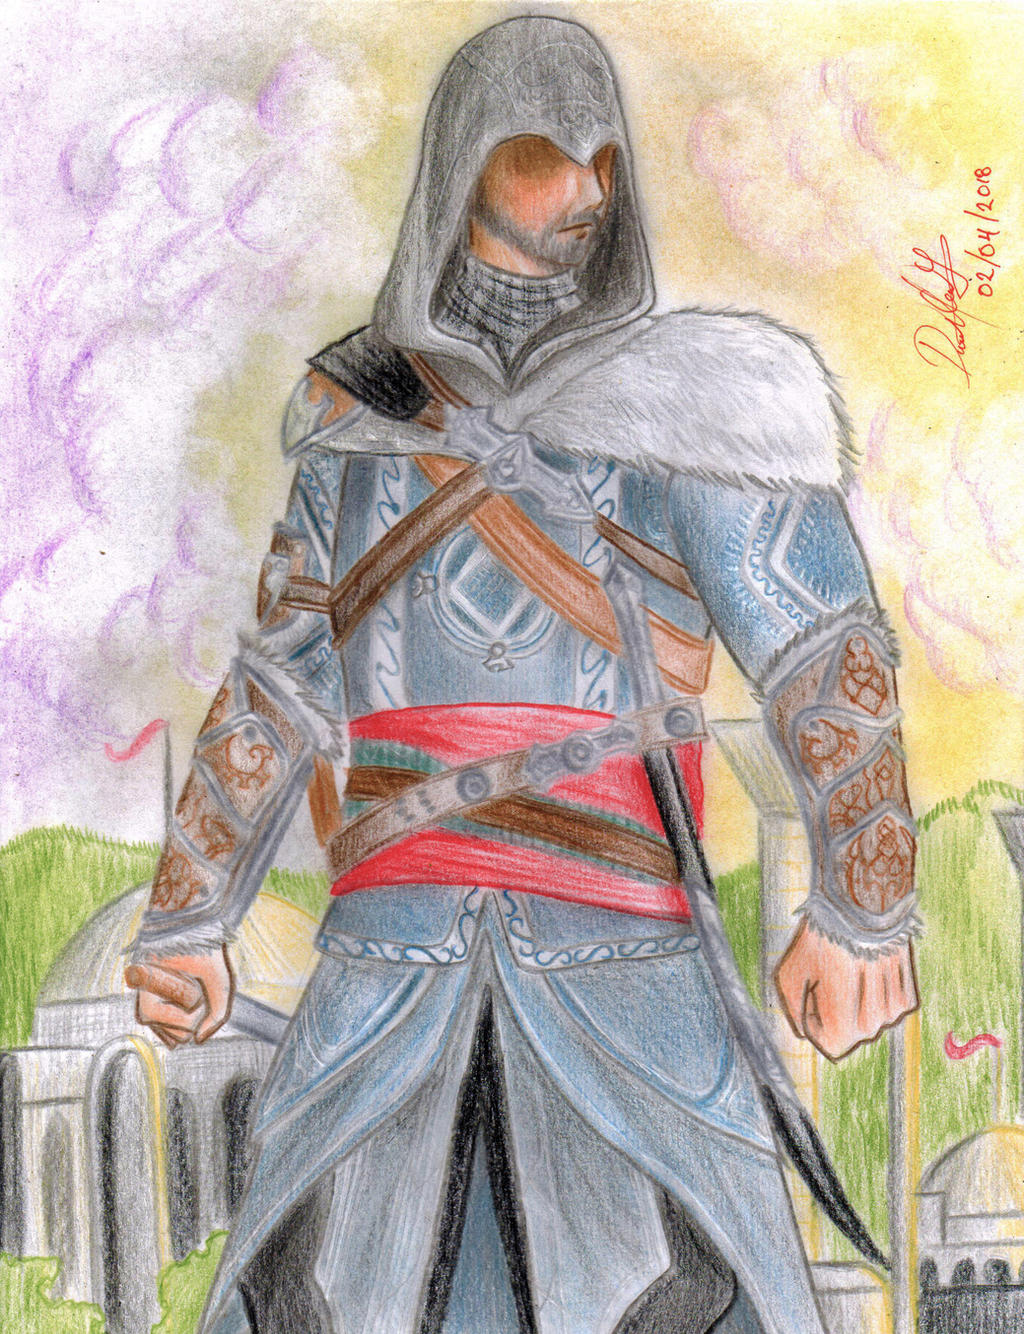 Ezio Auditore (Assassin's Creed: Revelations) by danielcamilo